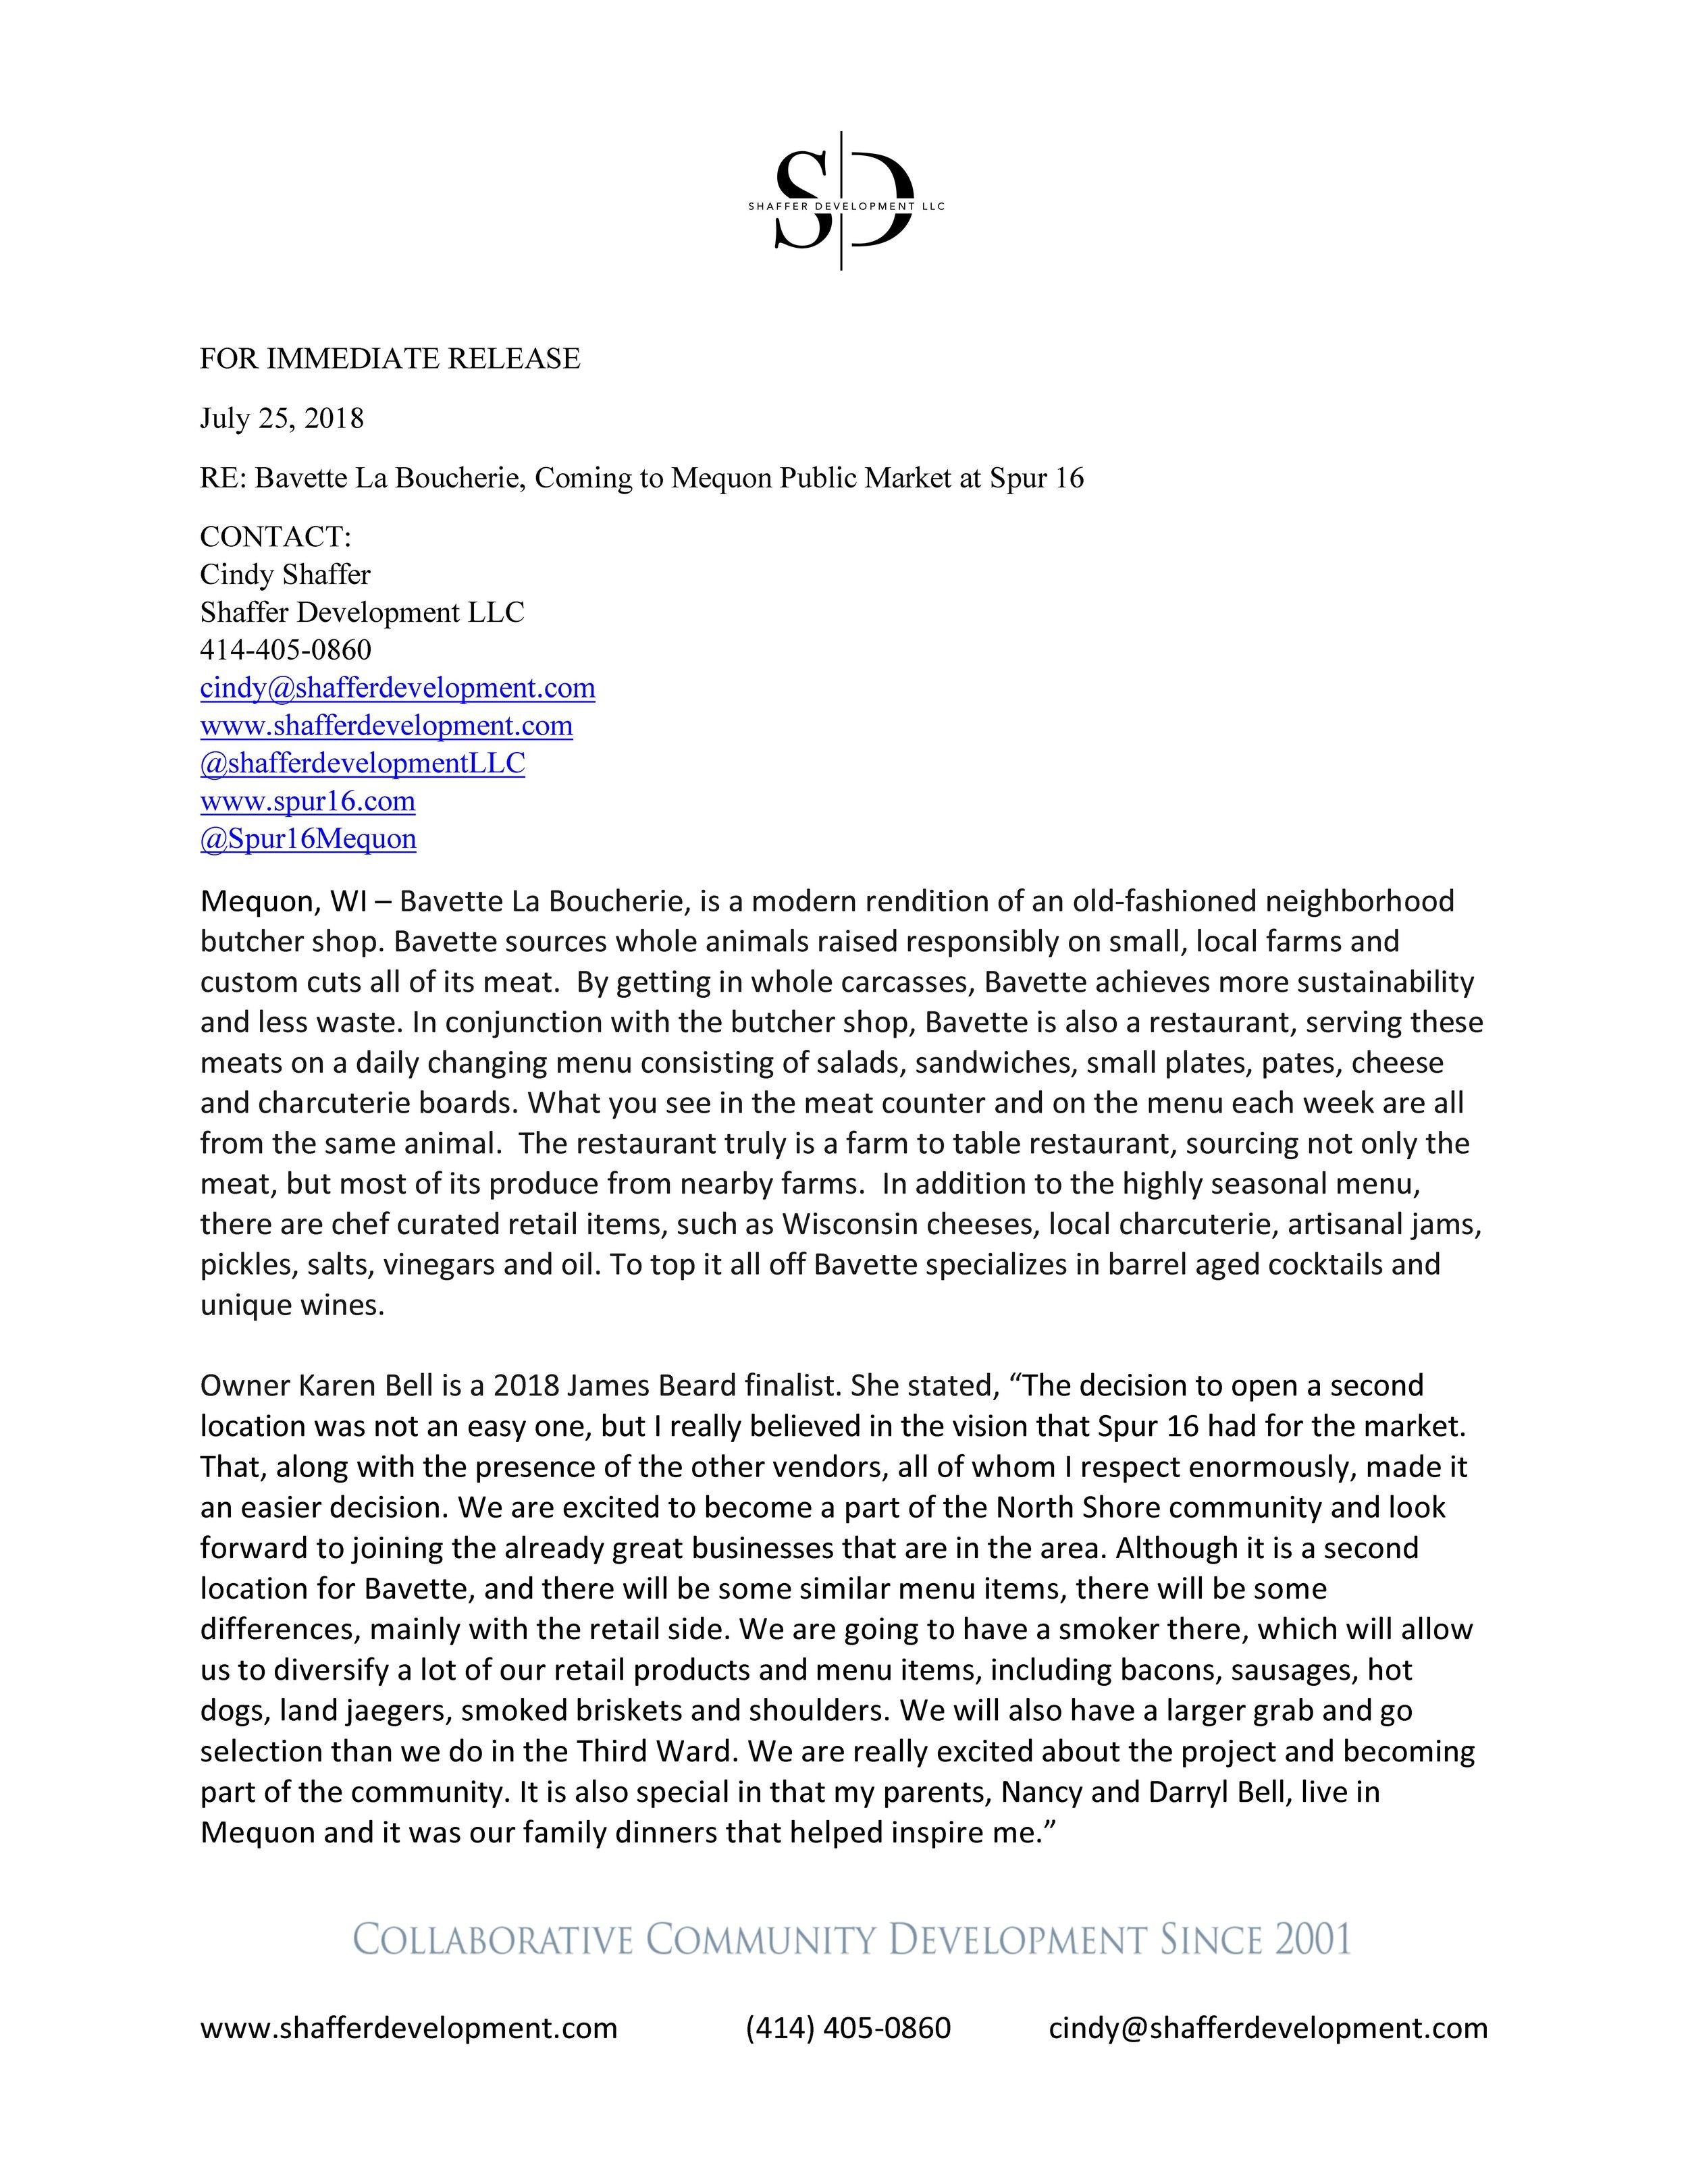 Bavette Press Release_Page_1.jpg